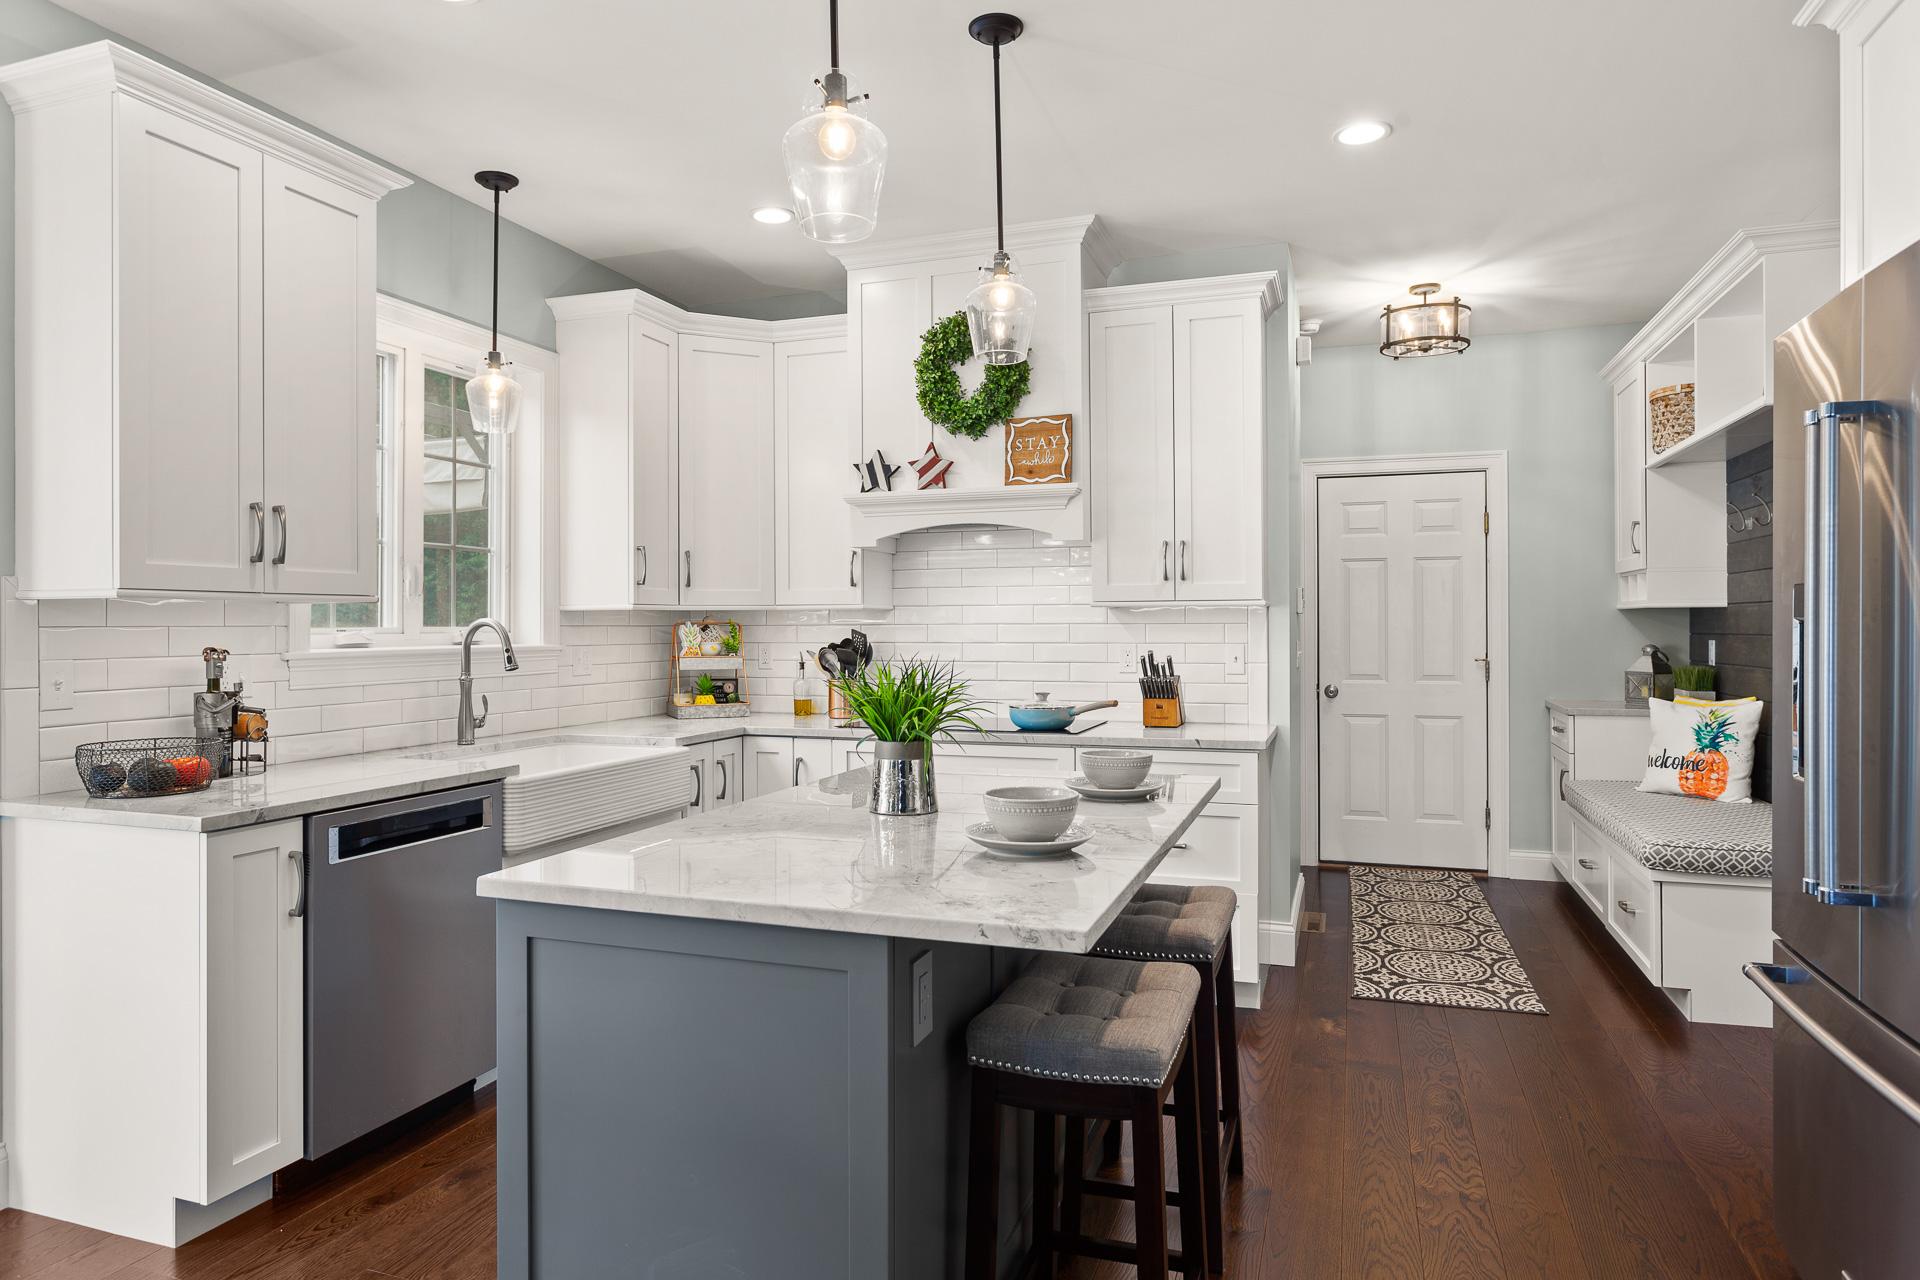 Modern Farmhouse Style Kitchen - Rhode Kitchen & Bath ...